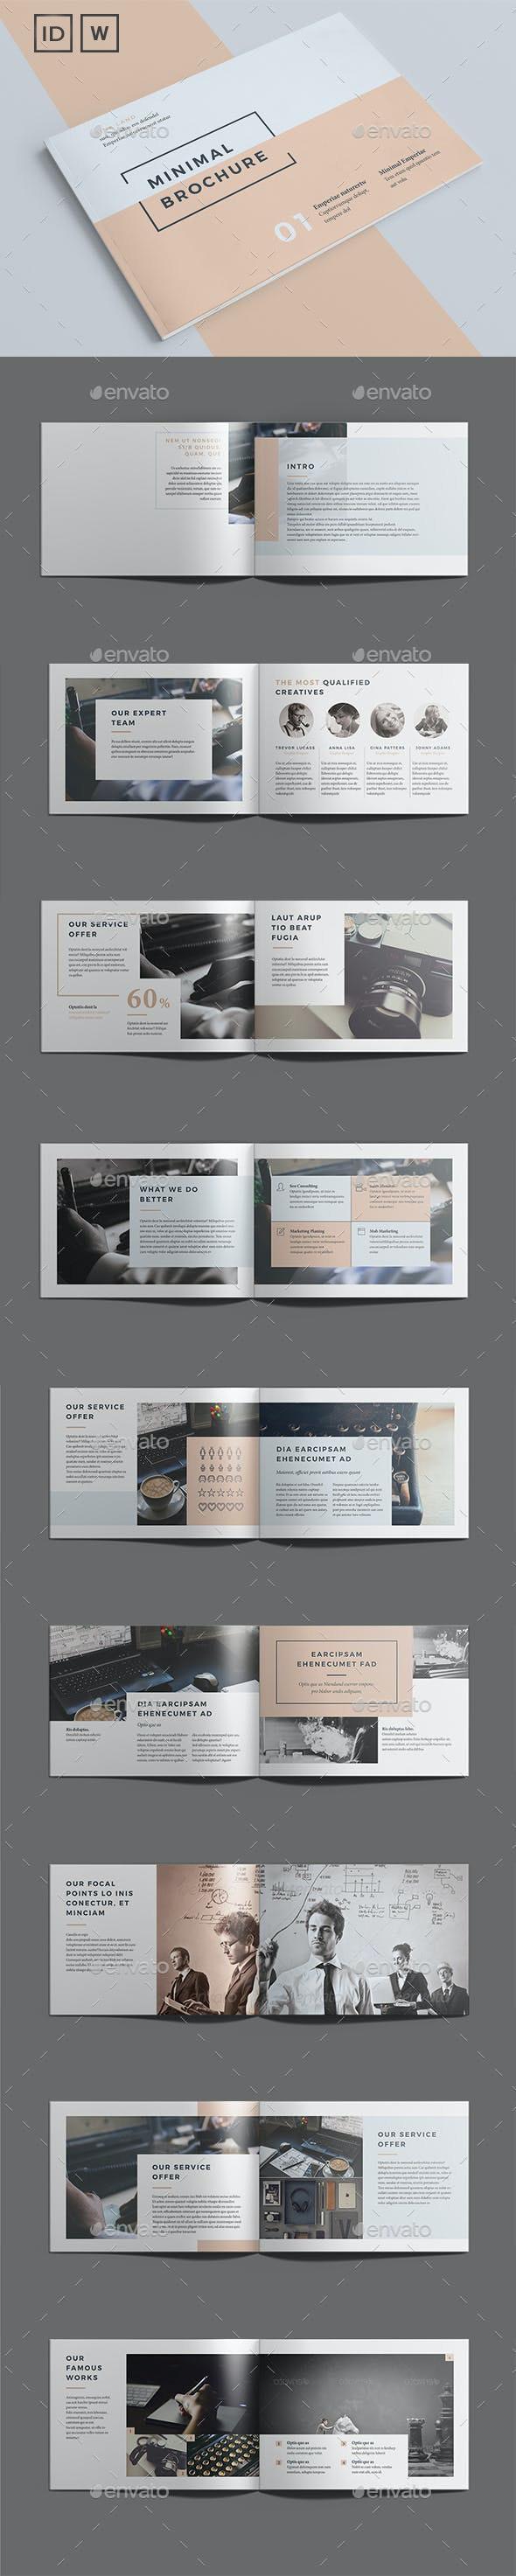 Minimal Brochure Vol II - Catalogs Brochures